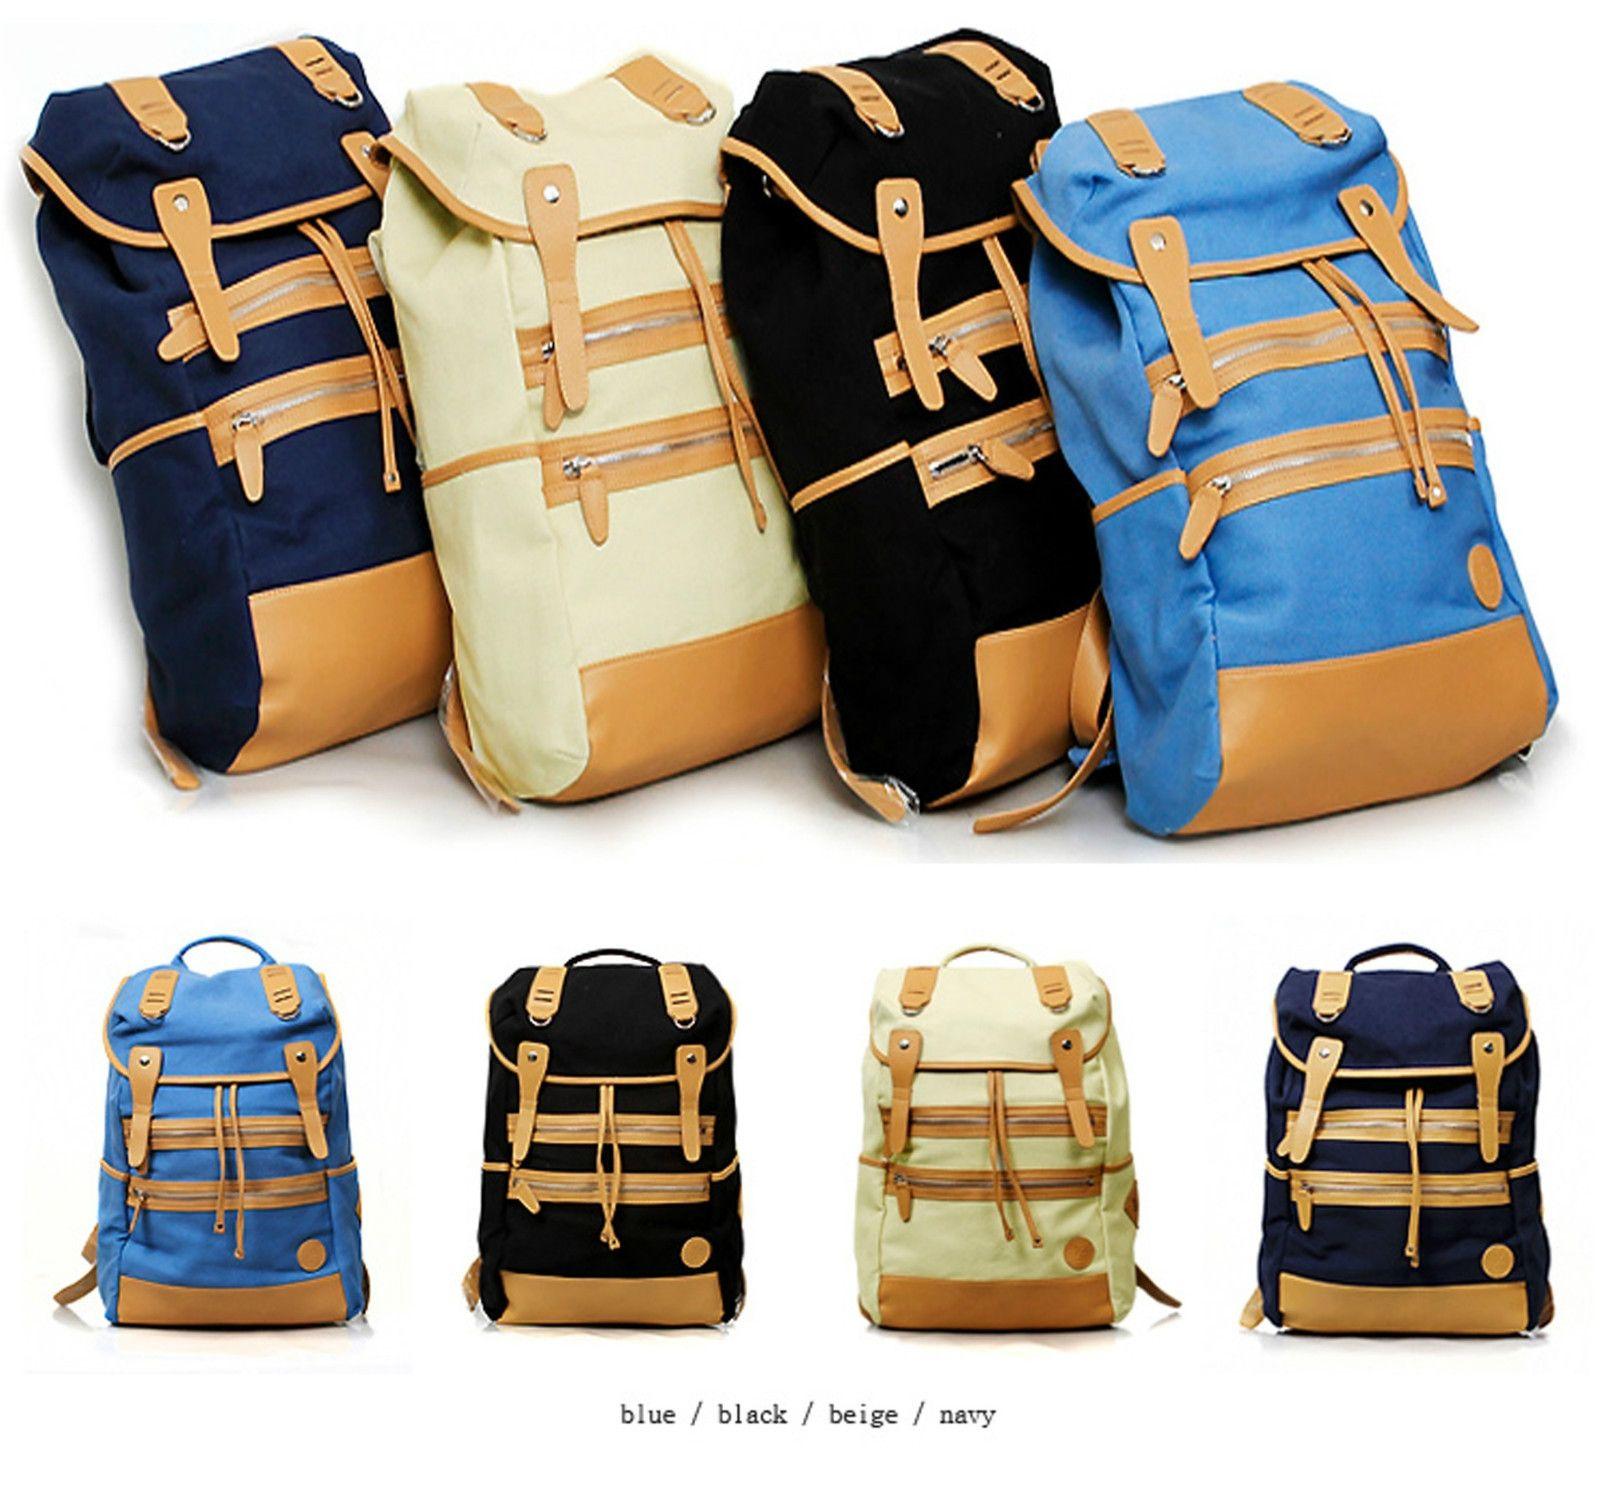 WOMENS MENS BACKPACKS SCHOOL BAG FASHION DESIGNED CANVAS BOOK BAG 2012S/SNWT -US $35.82